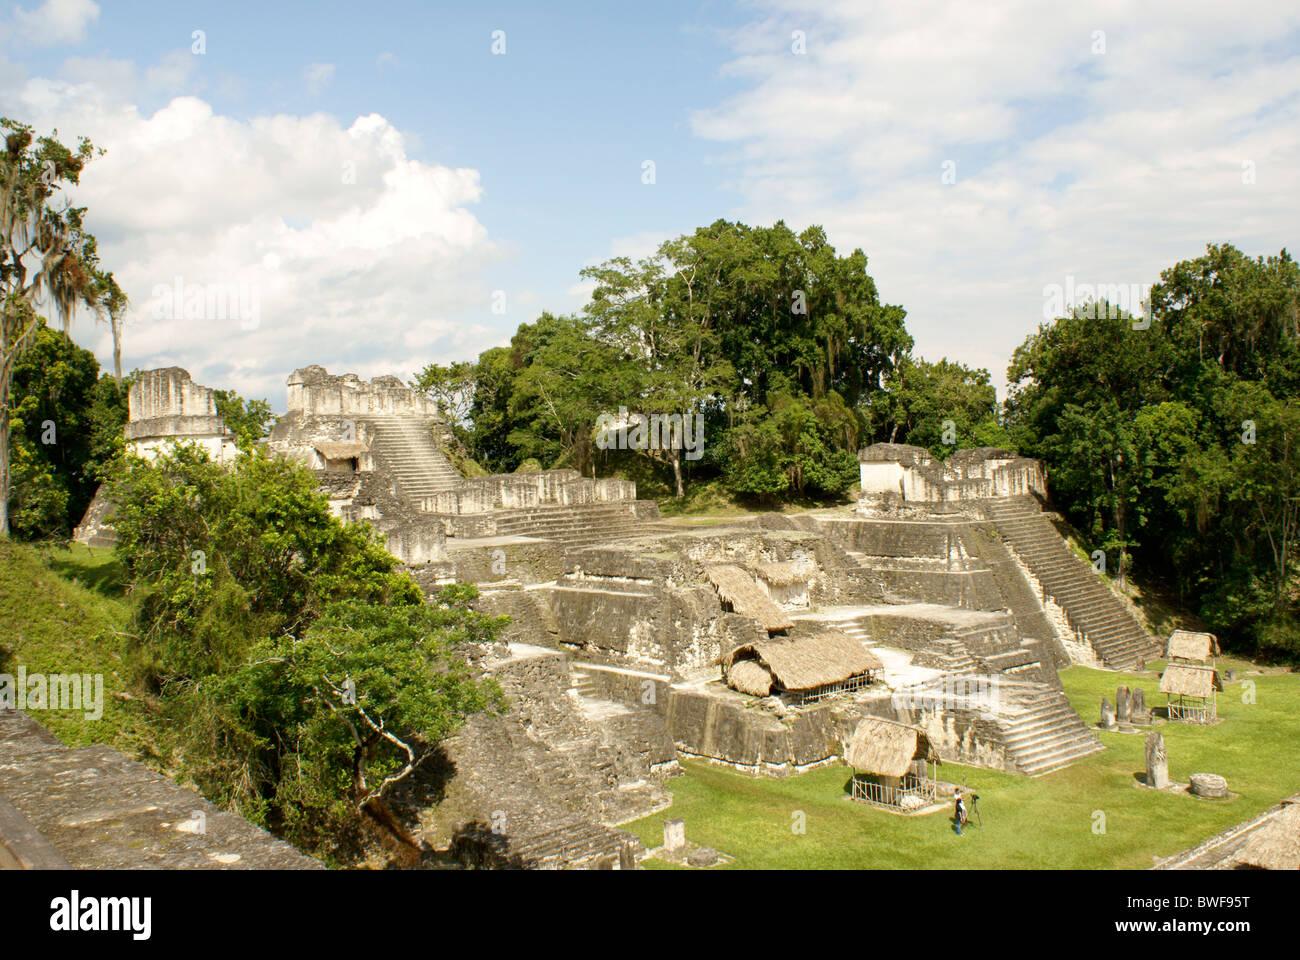 Central Acropolis at the Maya ruins of Tikal, El Peten, Guatemala. Tikal is a UNESCO World Heritage Site. - Stock Image